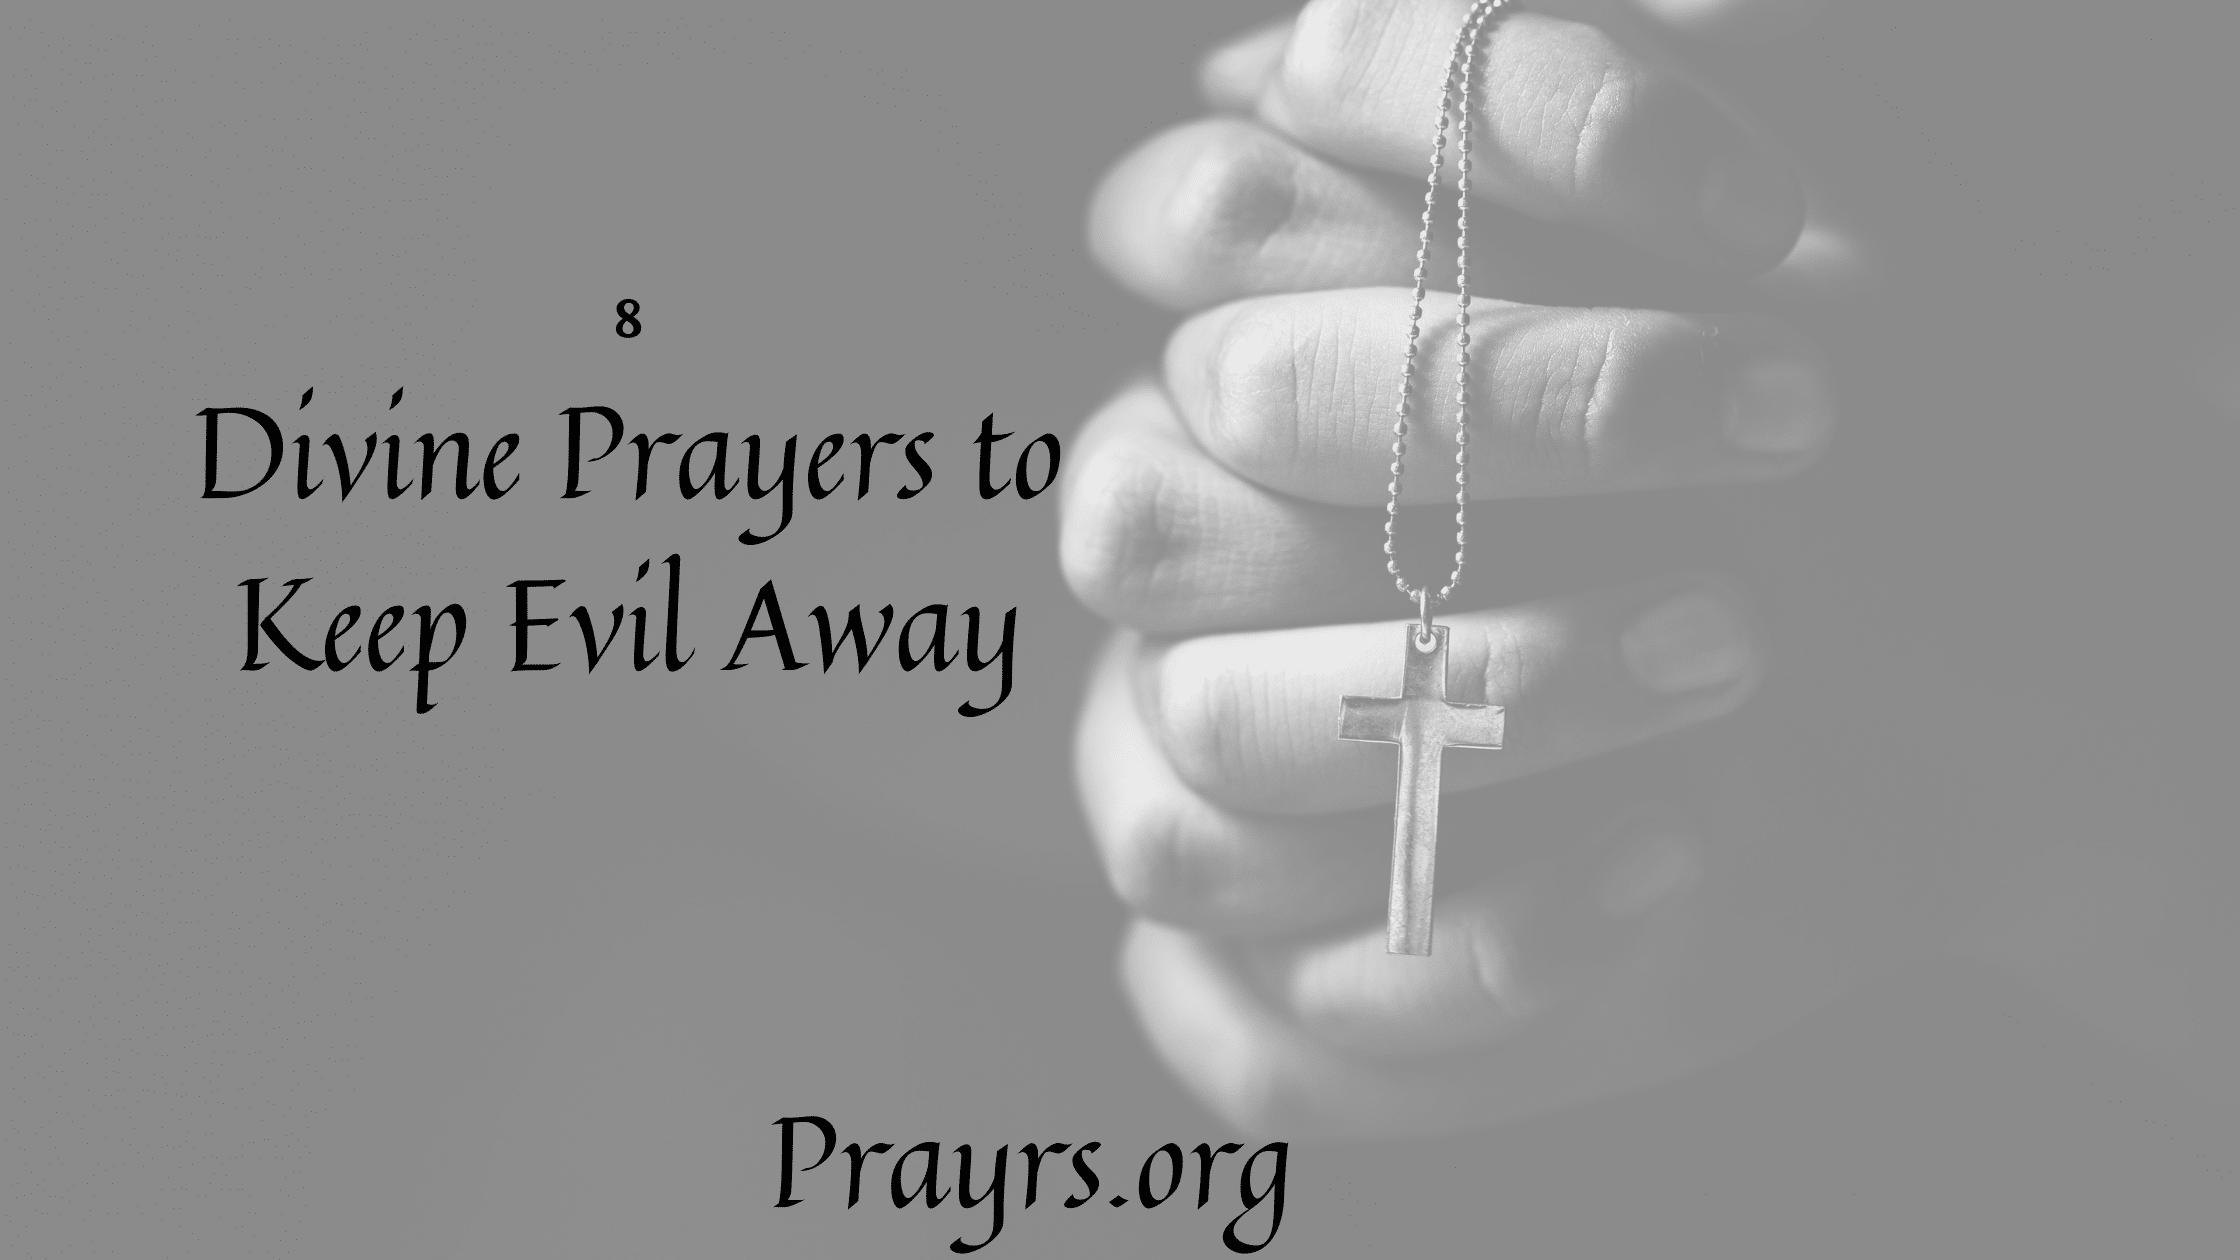 Divine Prayers to Keep Evil Away